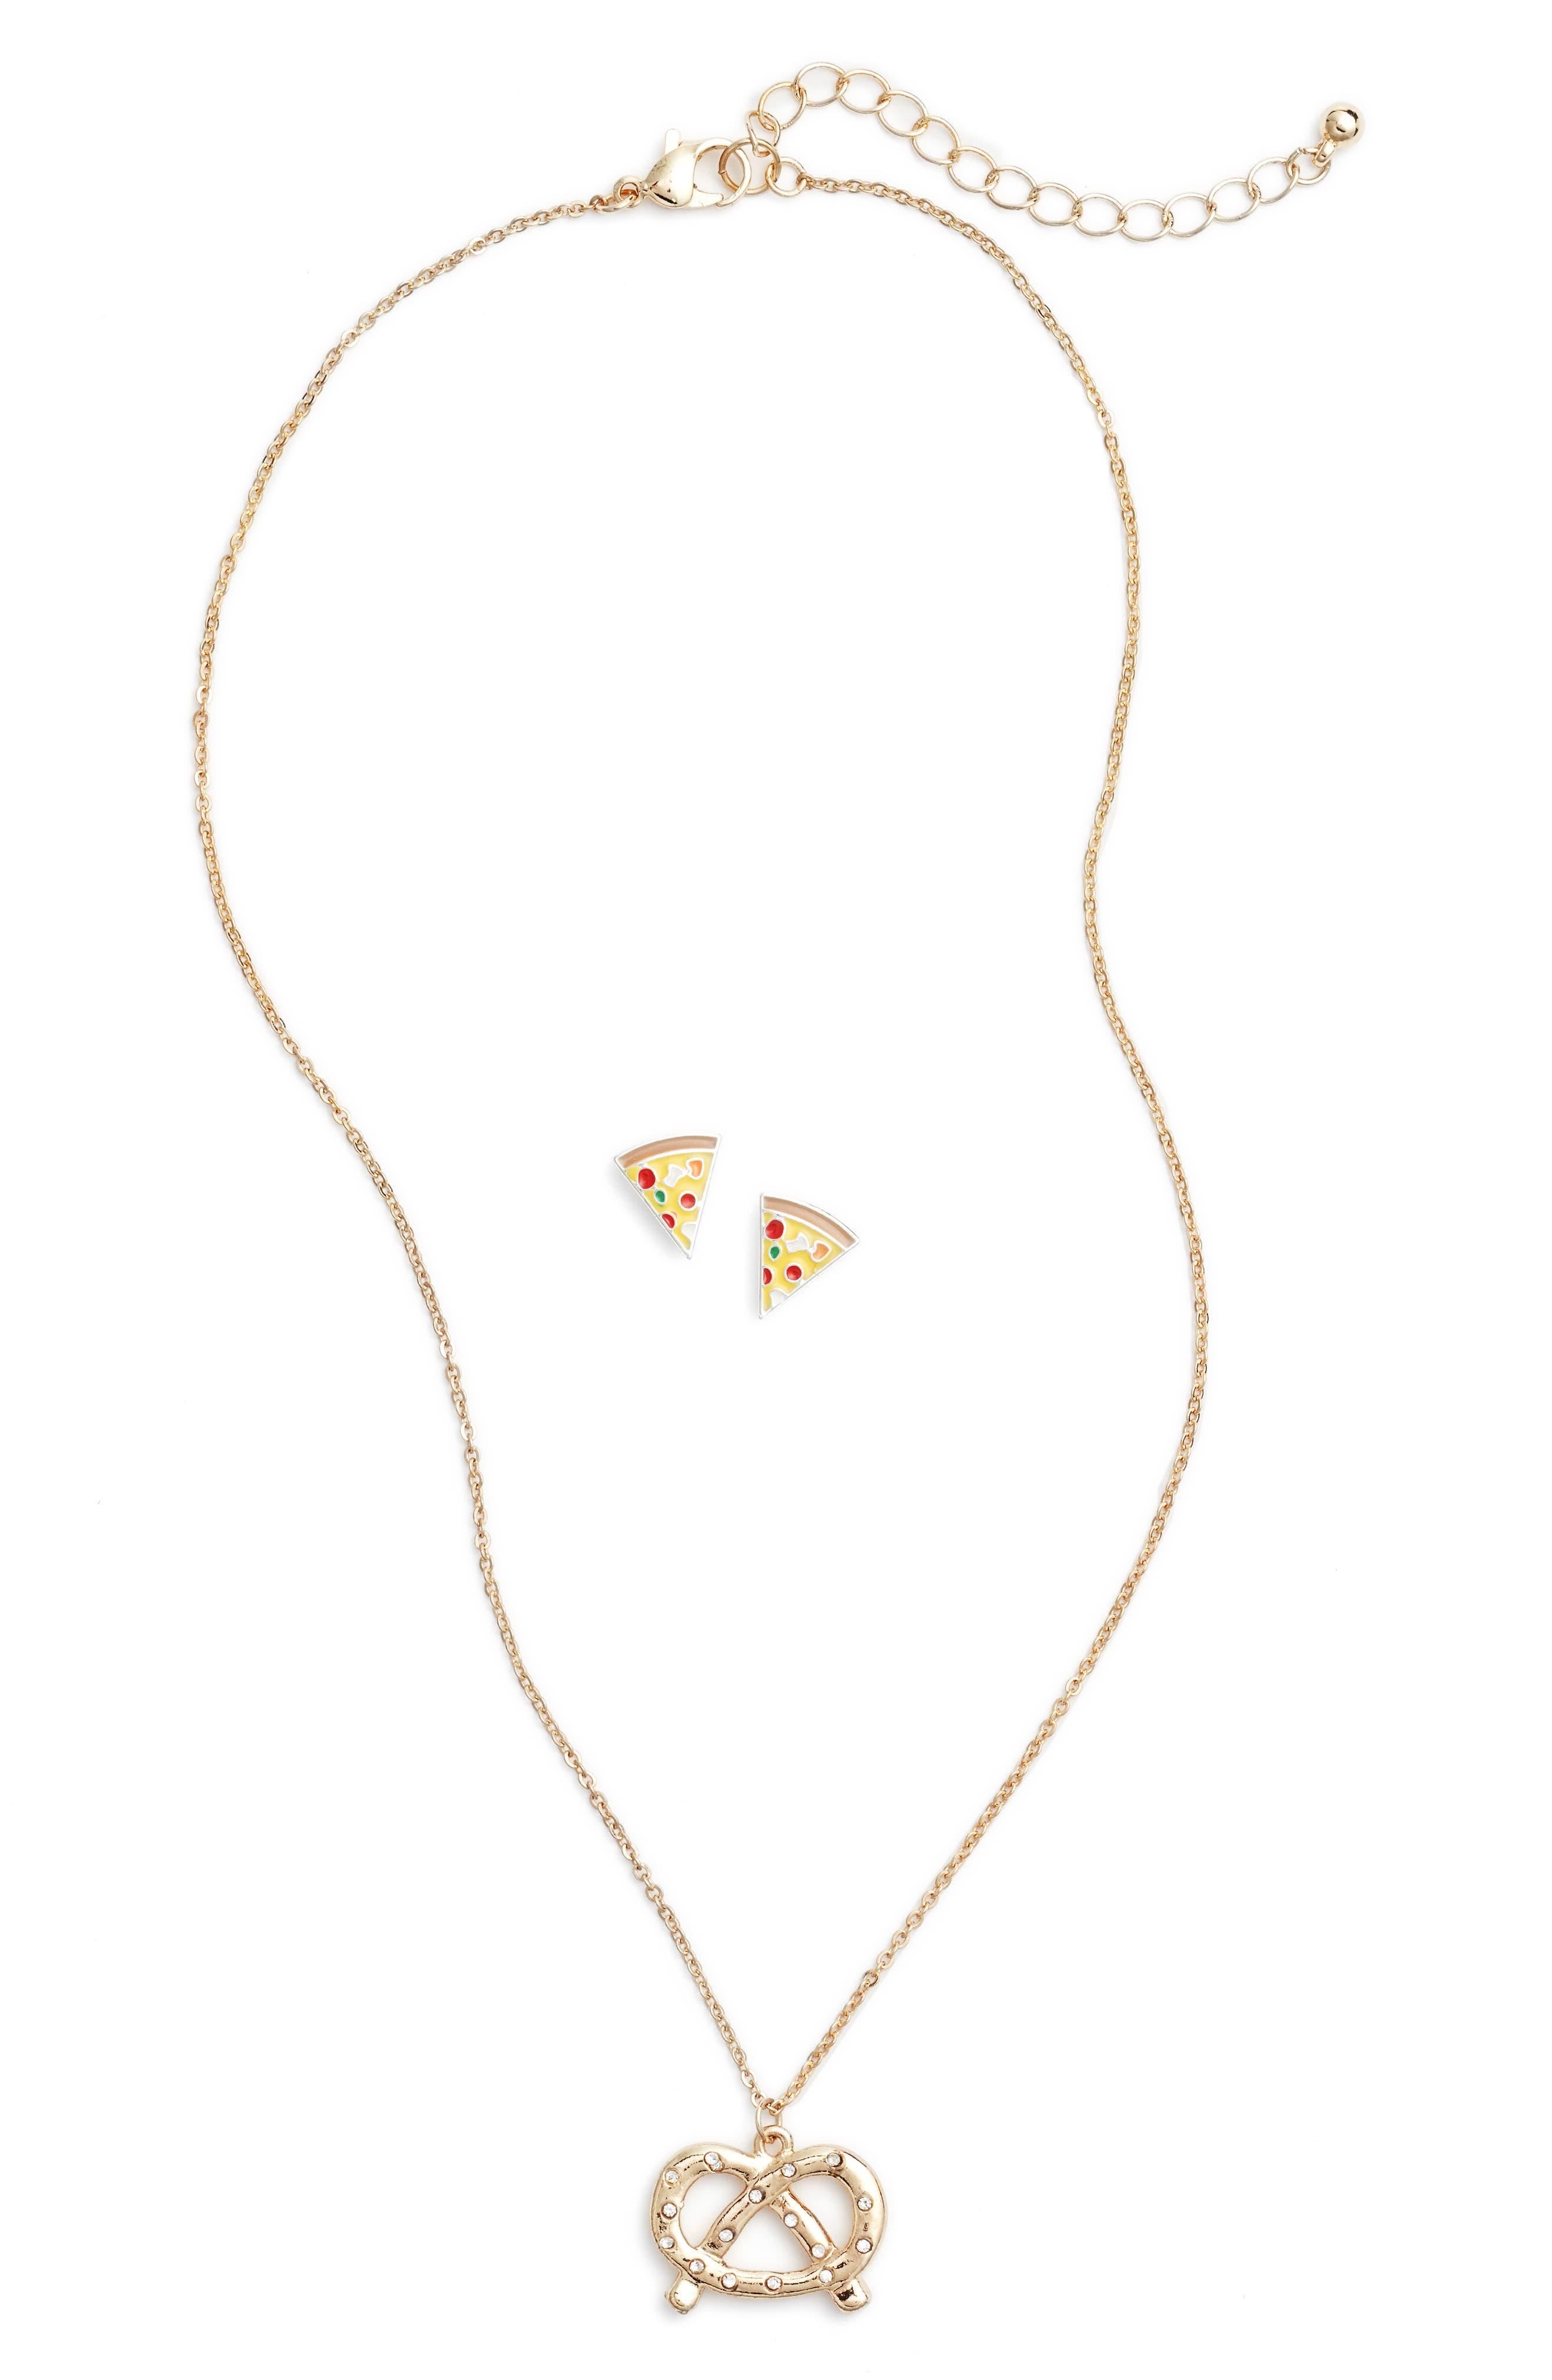 Alternate Image 1 Selected - Capelli New York Pug Love Pendant Necklace & Earrings Set (Girls)